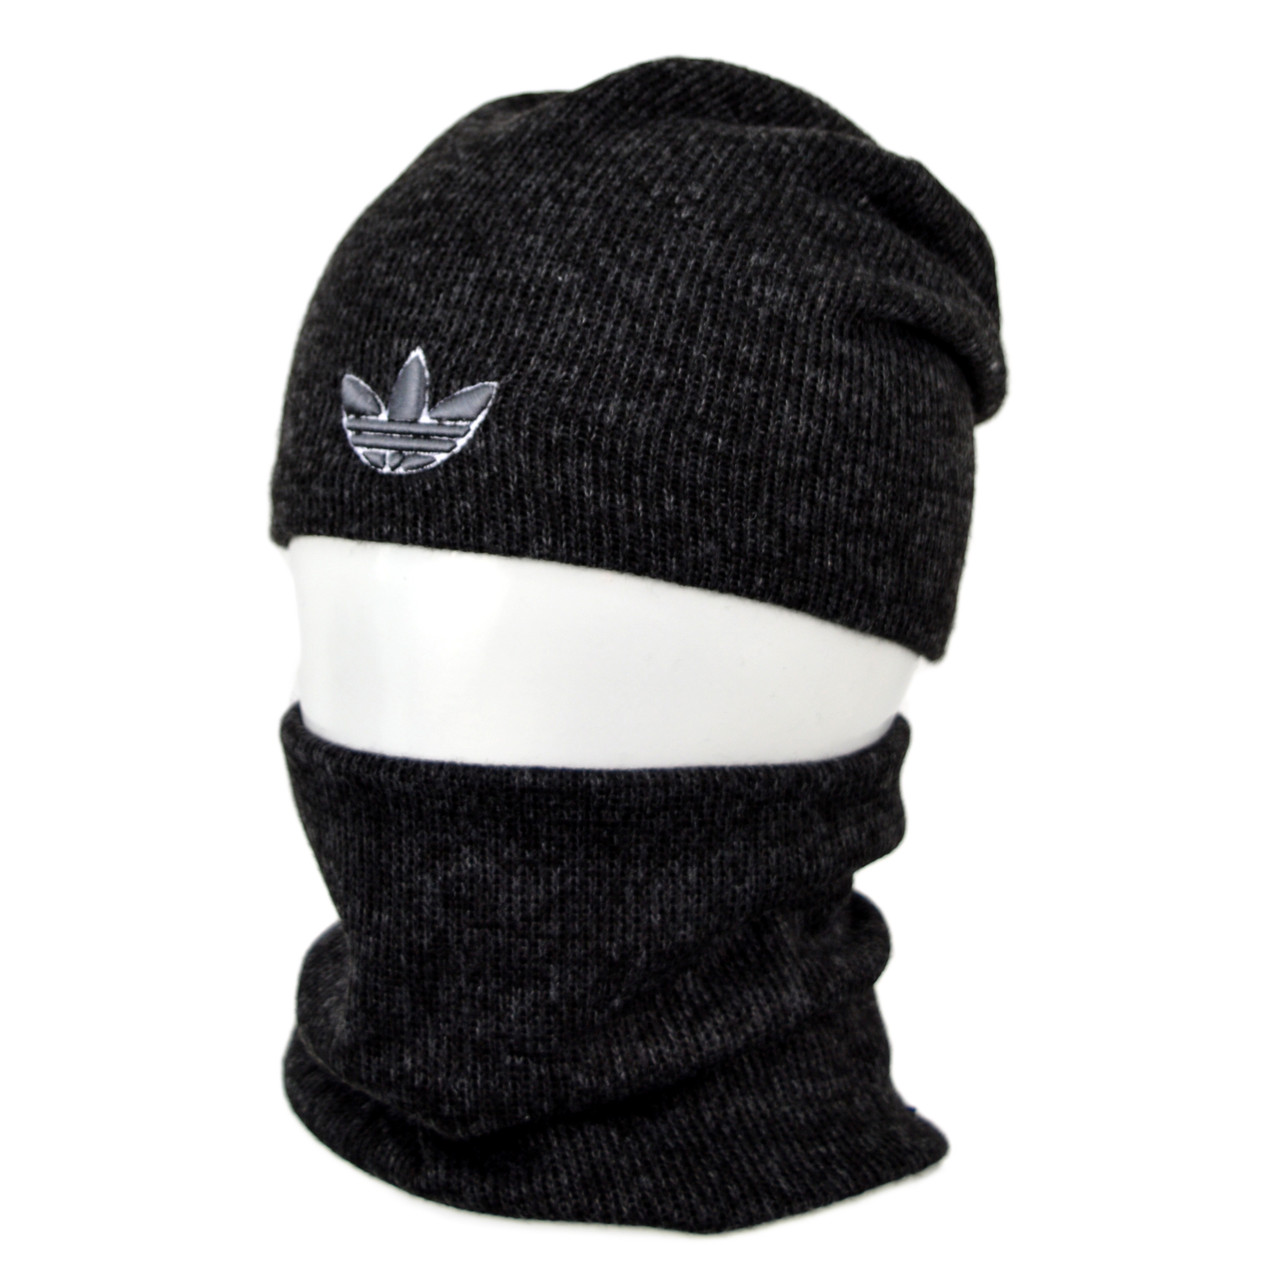 Комплект шапка+баф adidas SP1902 черный